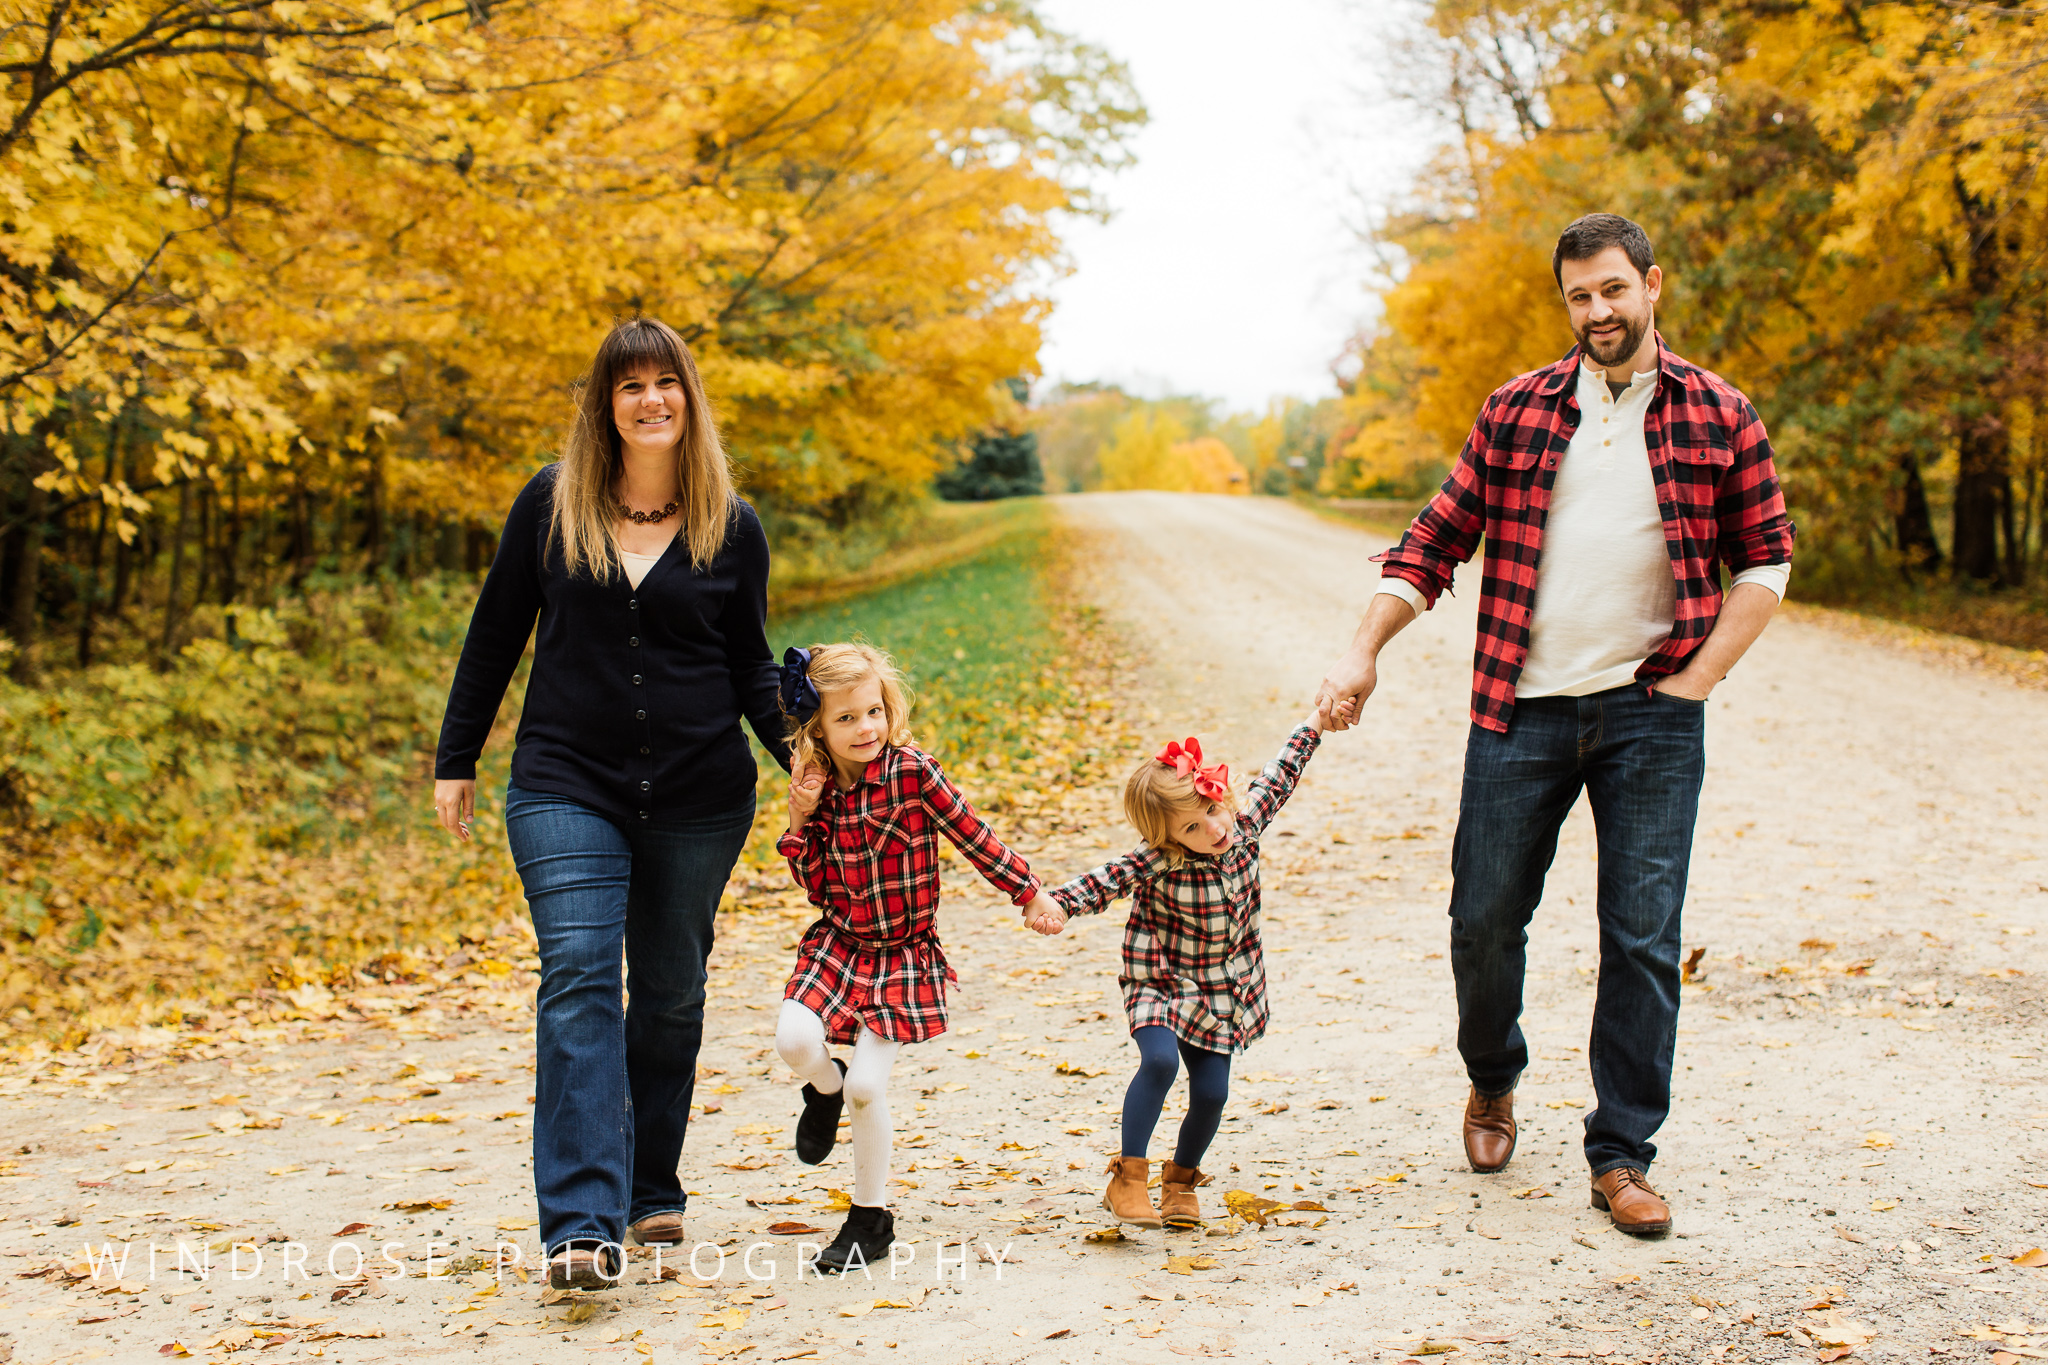 Fall-Family-Portrait-Session-Byron-MN-14.jpg